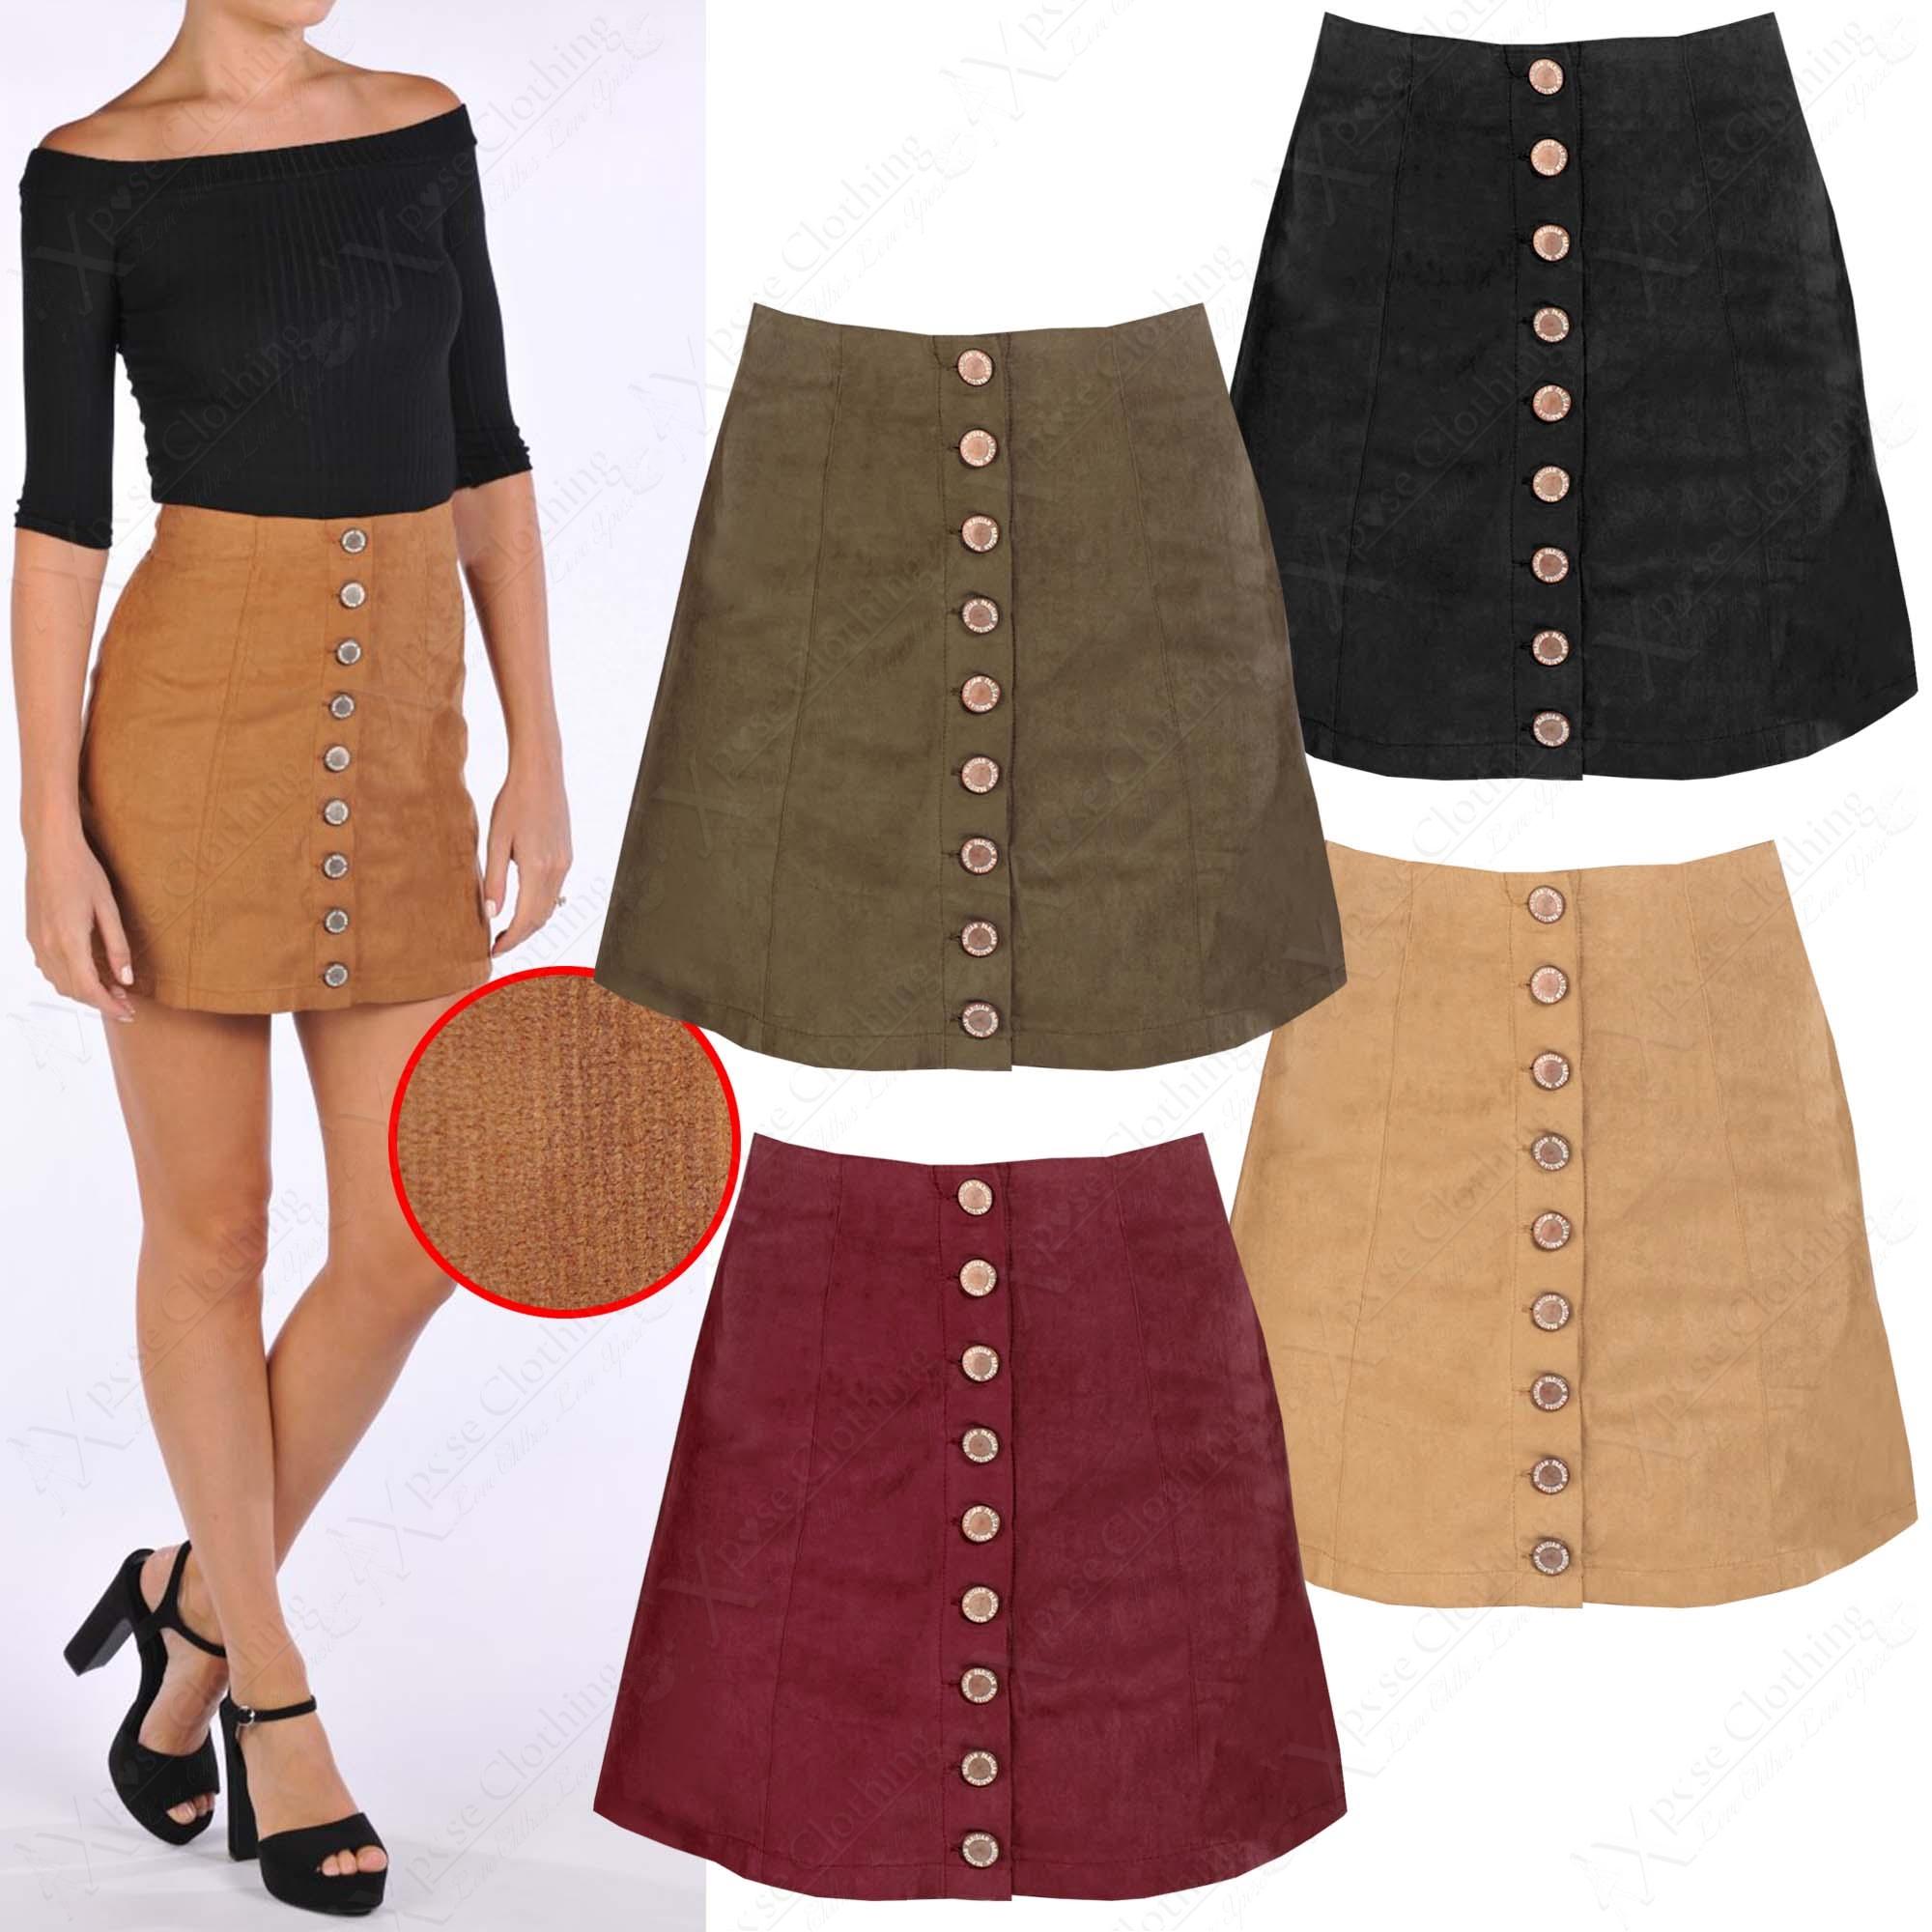 e366986e2162 Black Corduroy Button Up Skirt